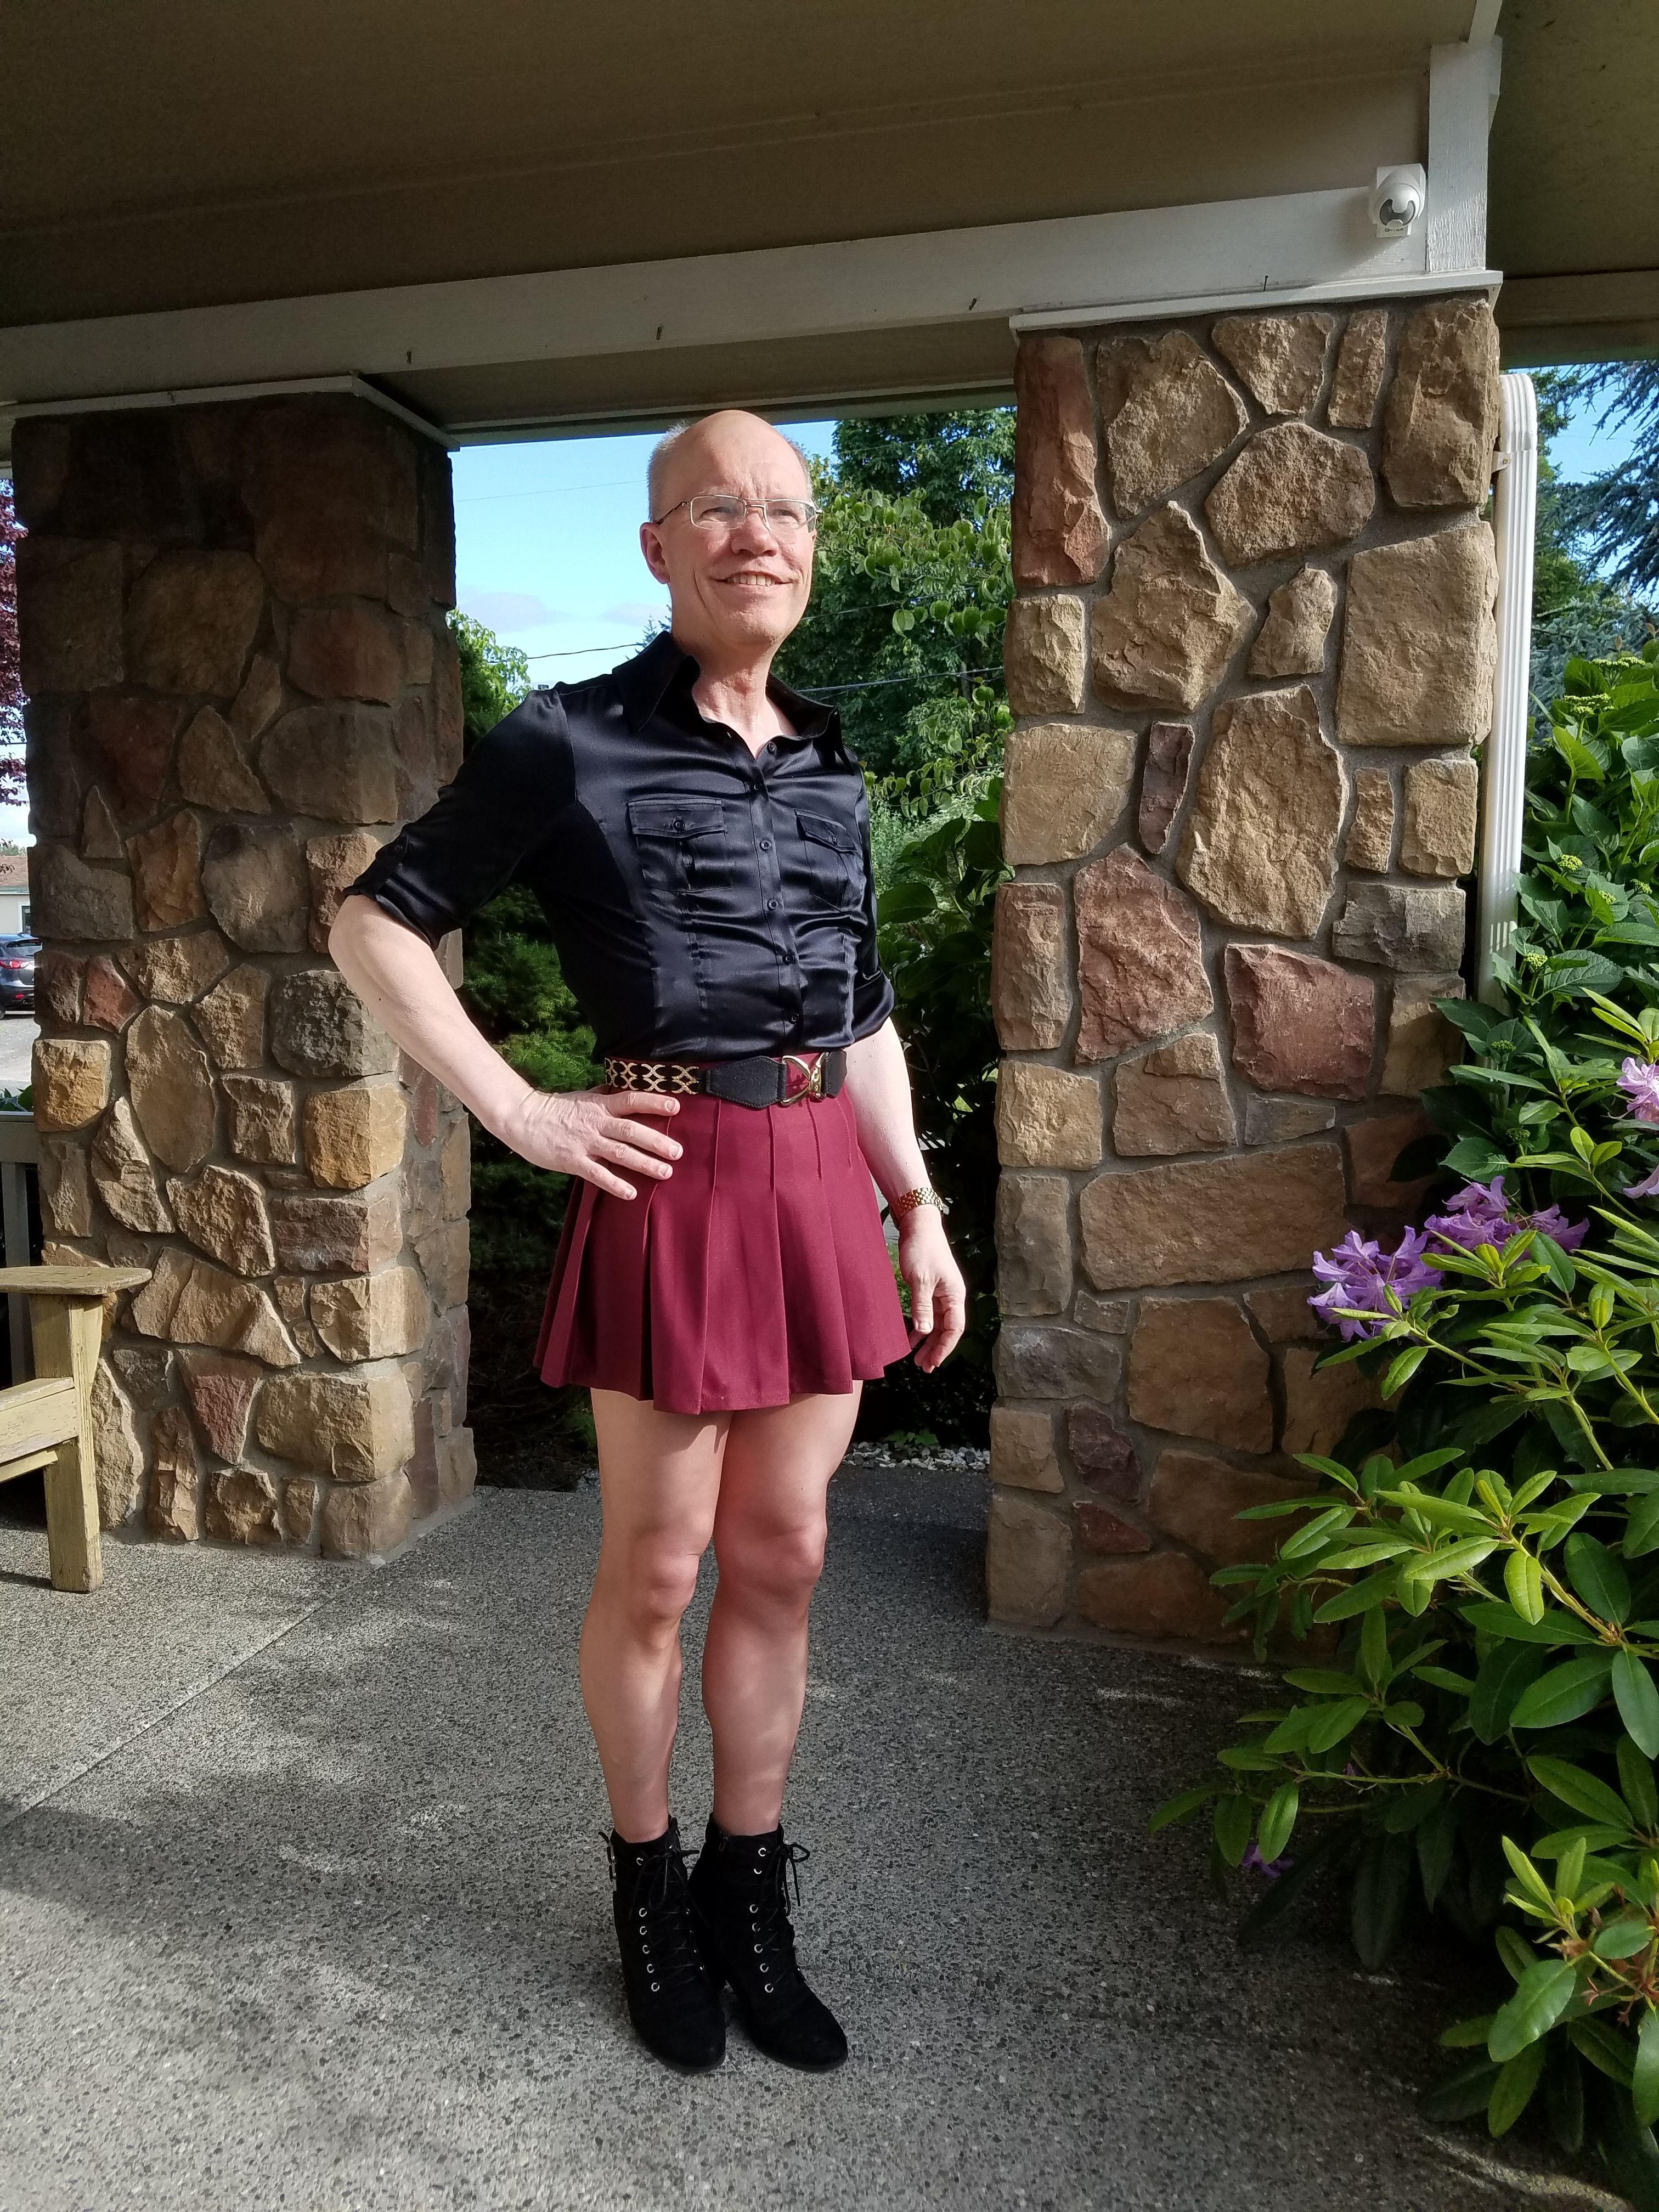 Black satin silk shirt, pleated maroon tennis skirt